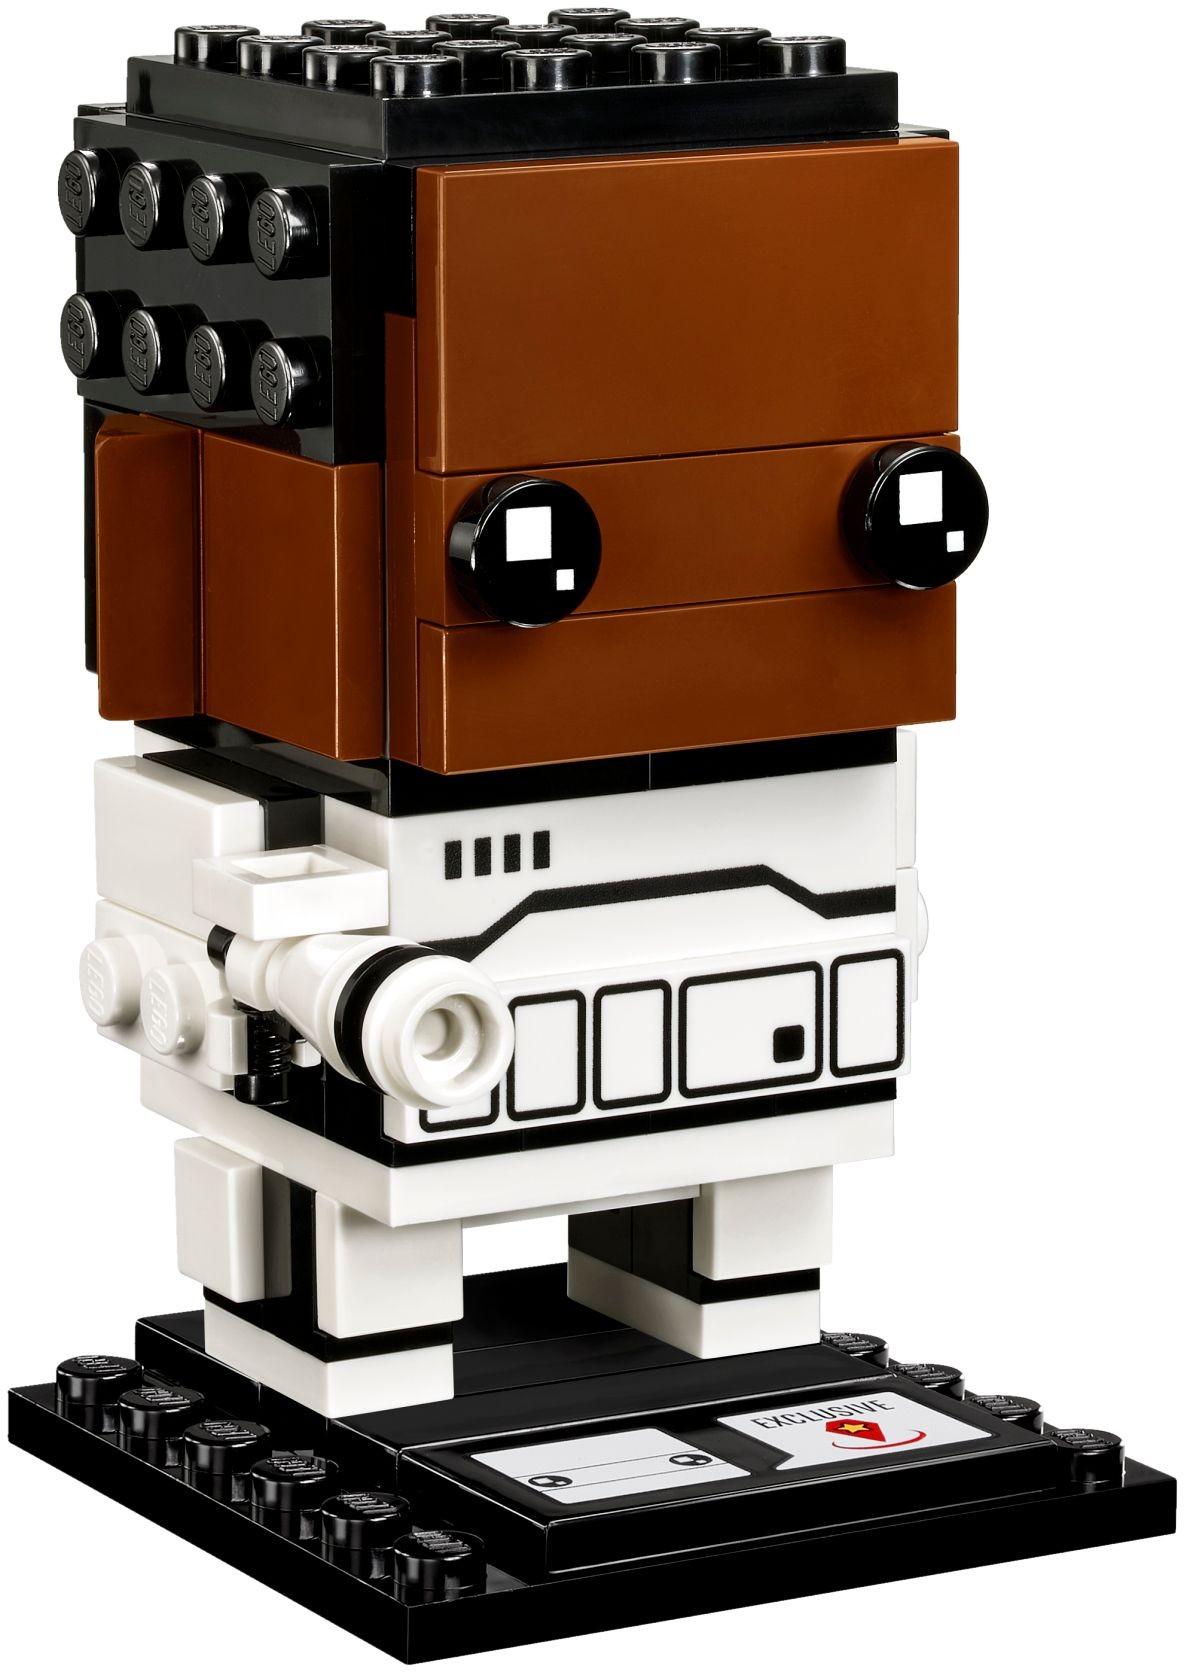 Darth Vader Captain Phasma Finn NEW LEGO Star Wars Brickheadz Choose a Set